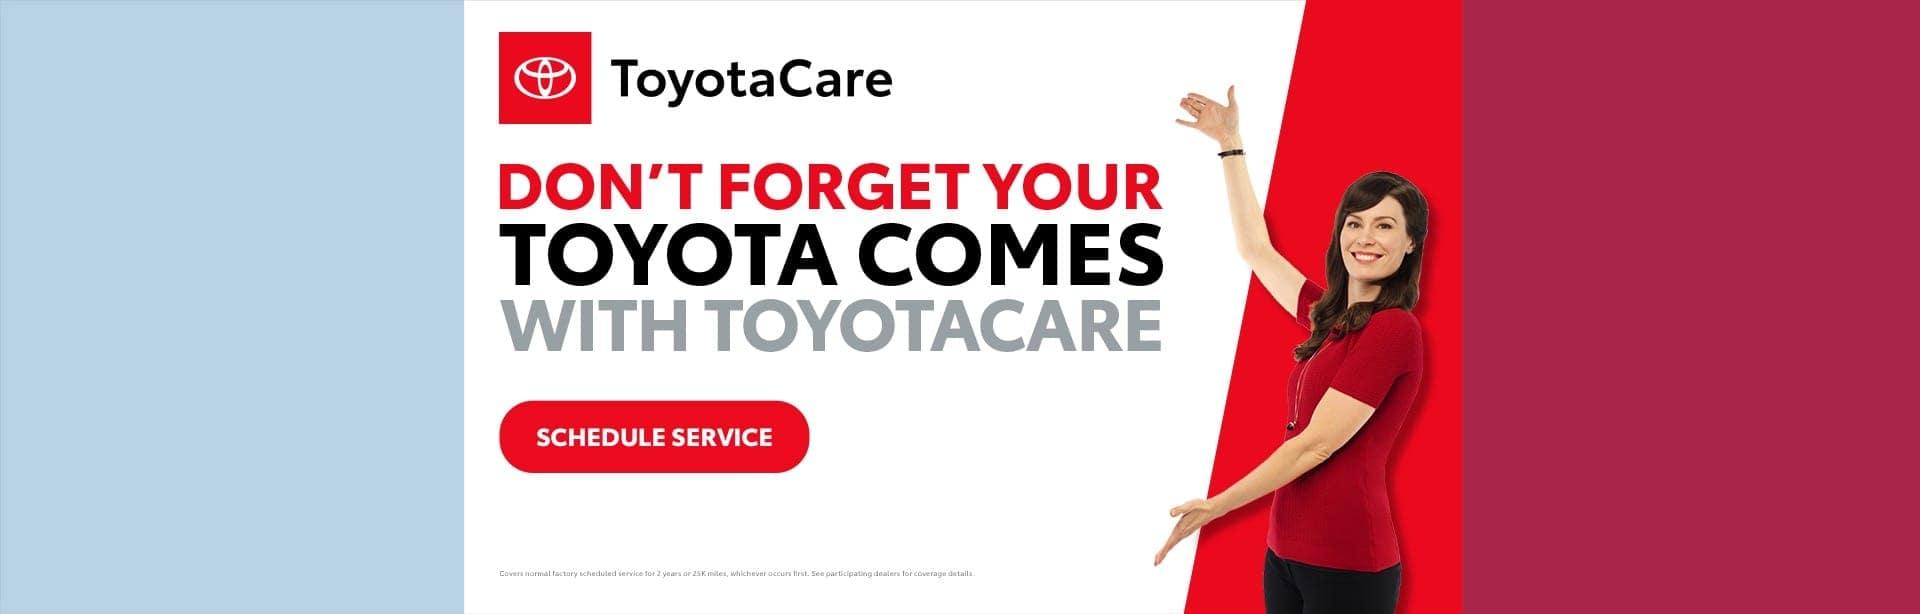 ToyotaCare Banner